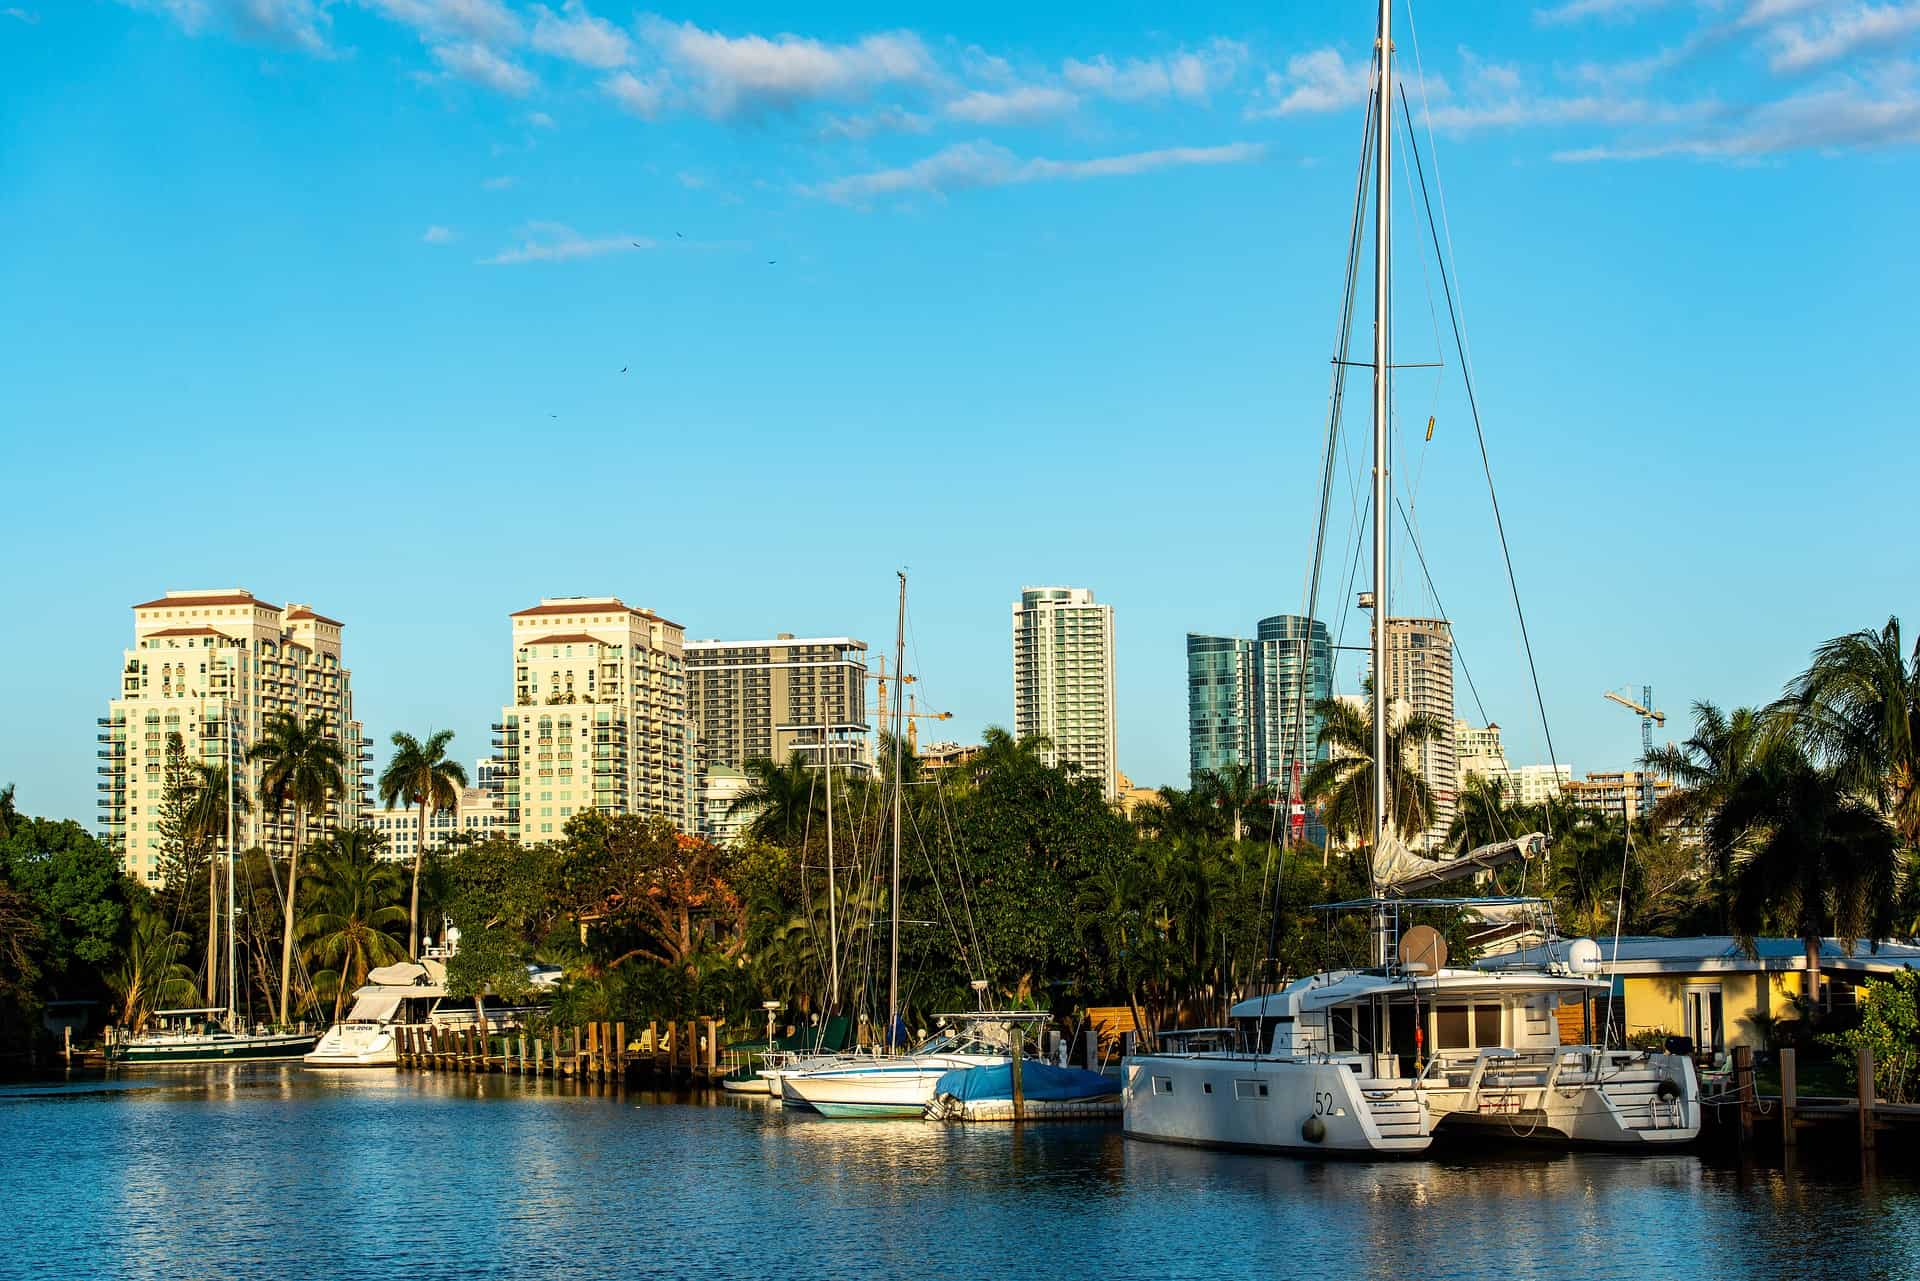 Cose da fare a Fort Lauderdale